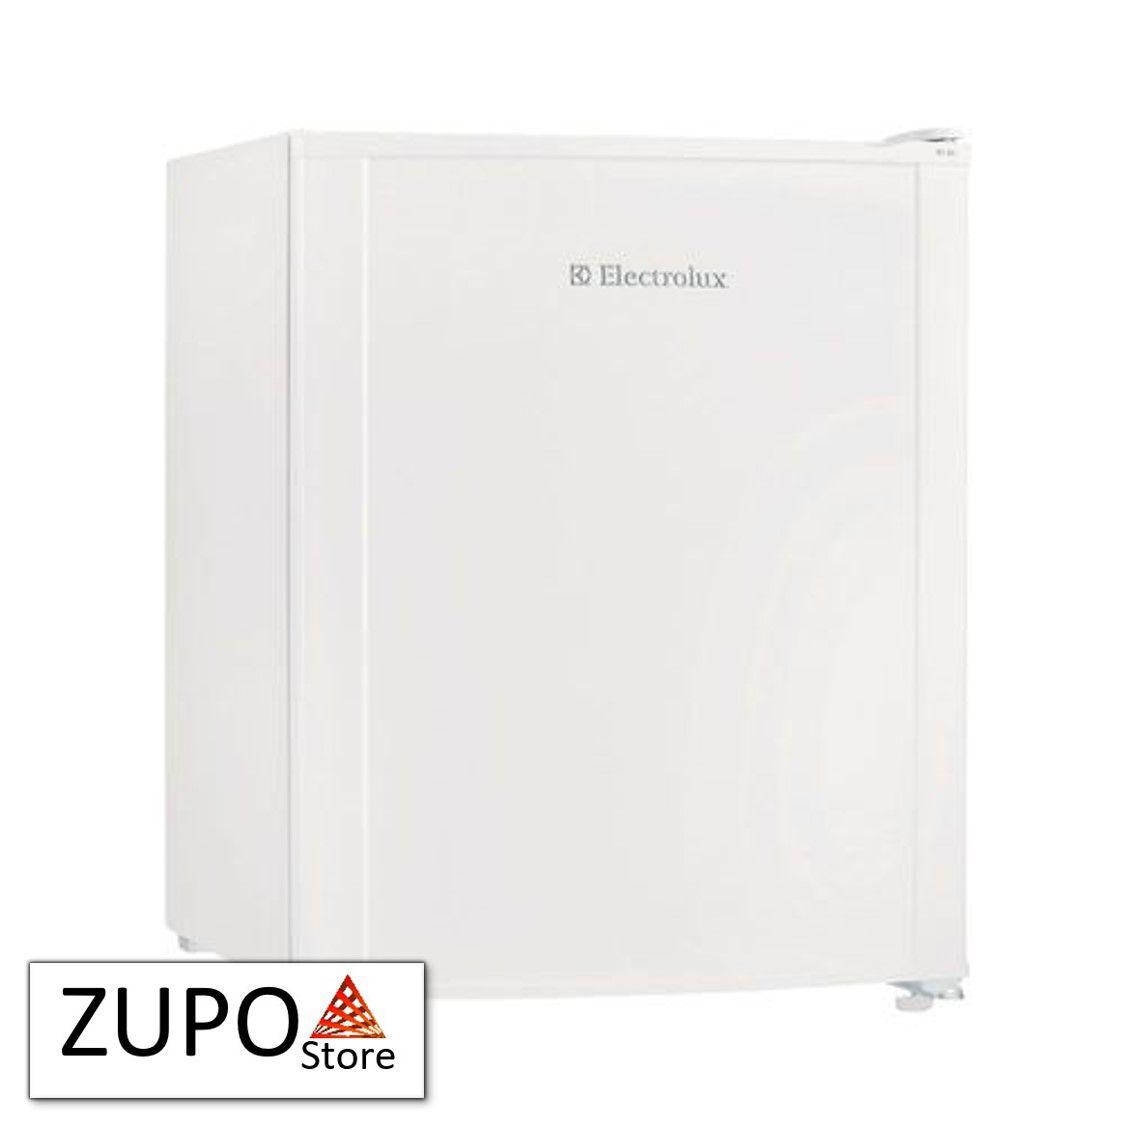 Frigobar Electrolux 79 Litros Branco - RE80 - 127V